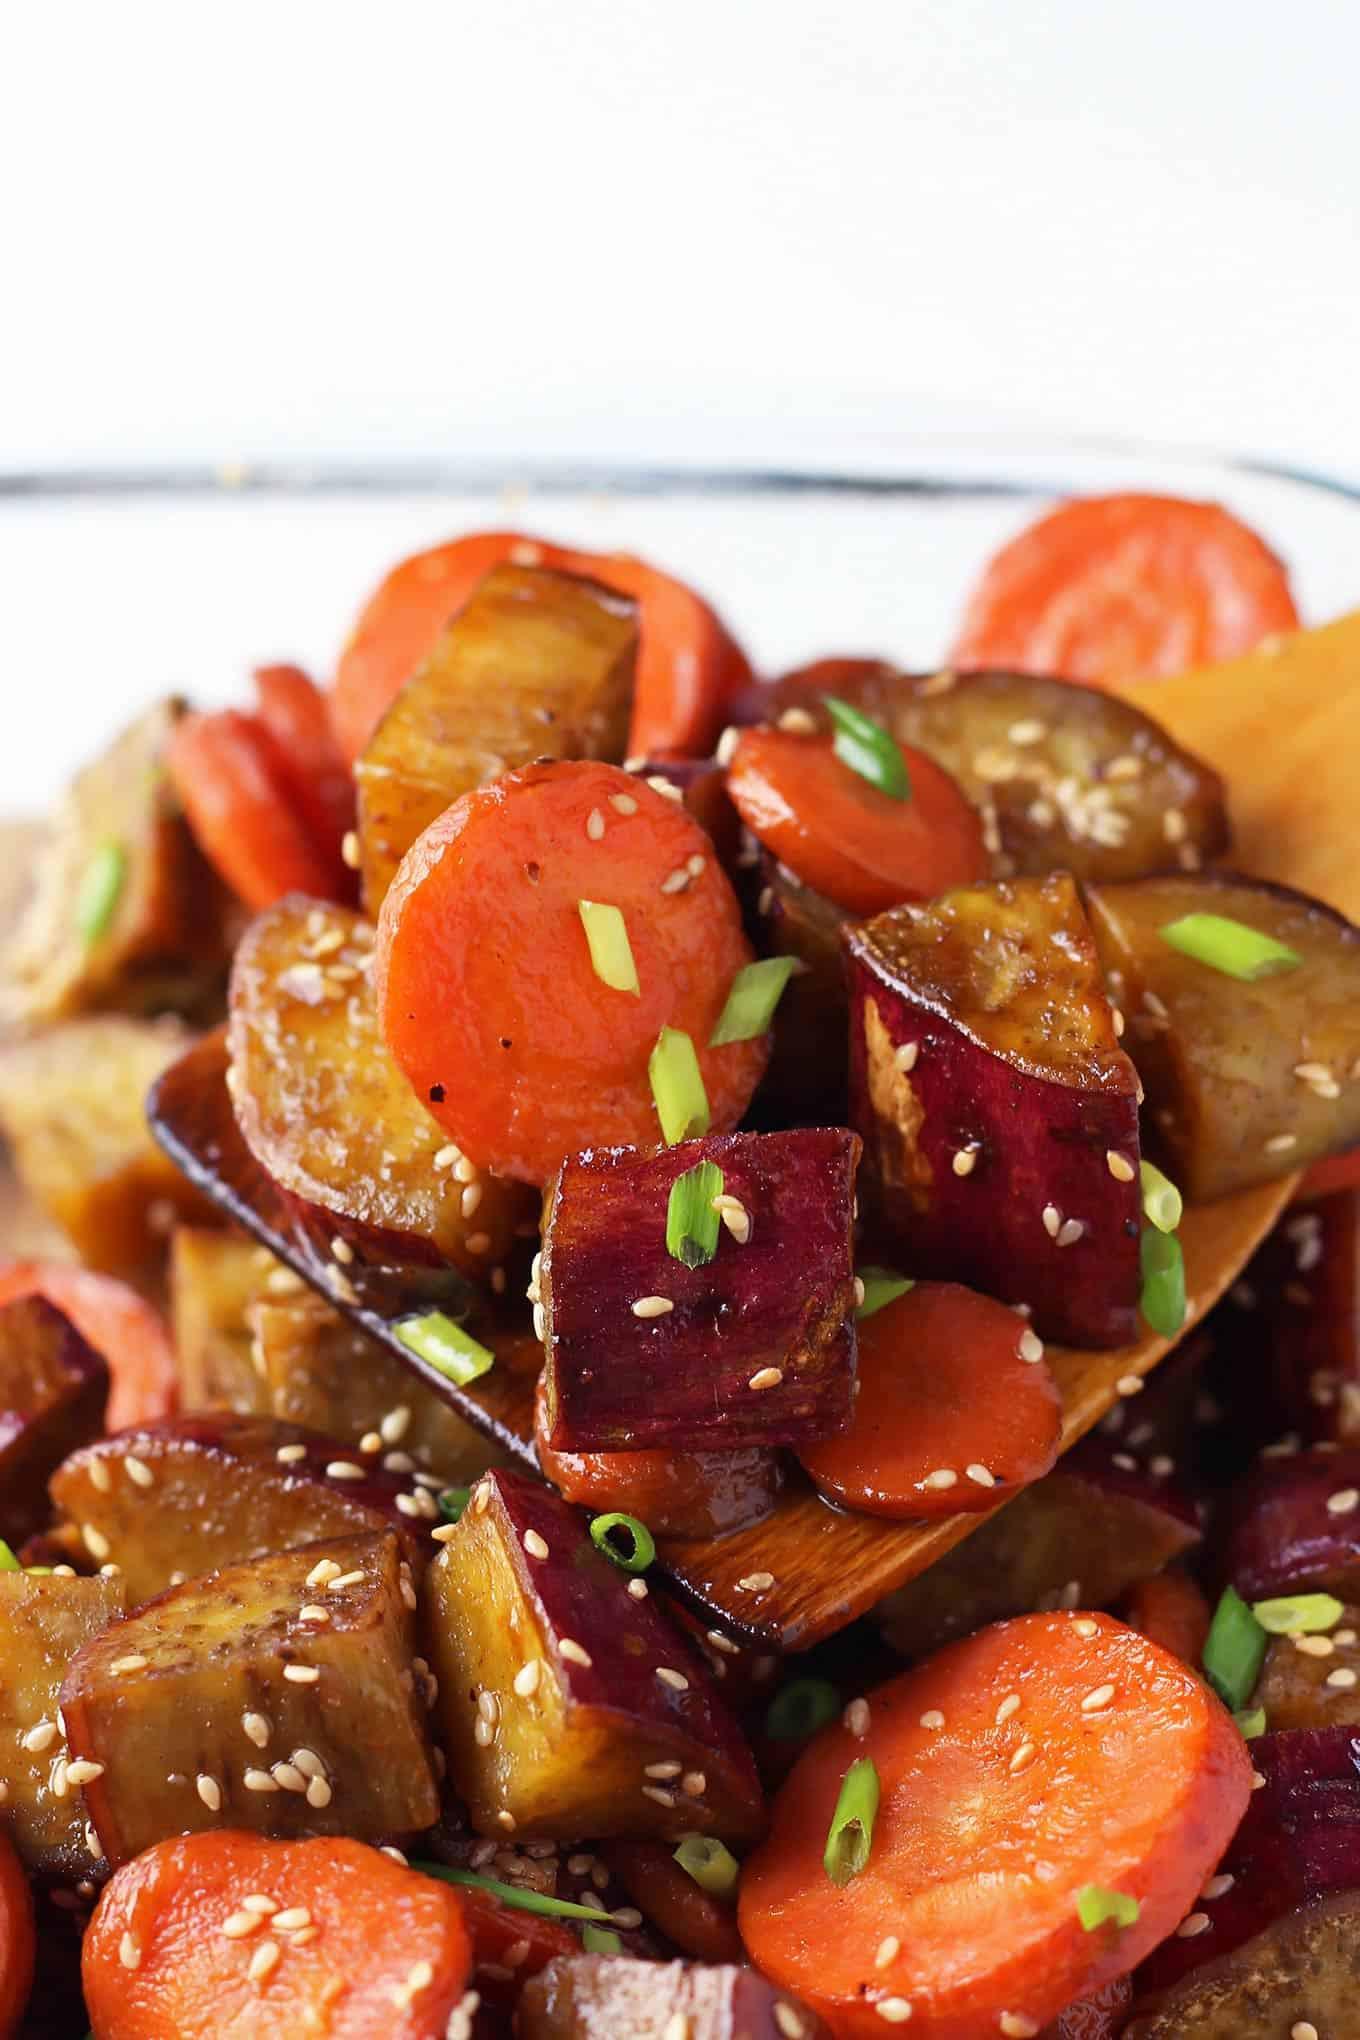 Roasted Sweet Potatoes And Carrots  Honey Sesame Roasted Sweet Potato and Carrots – LeelaLicious